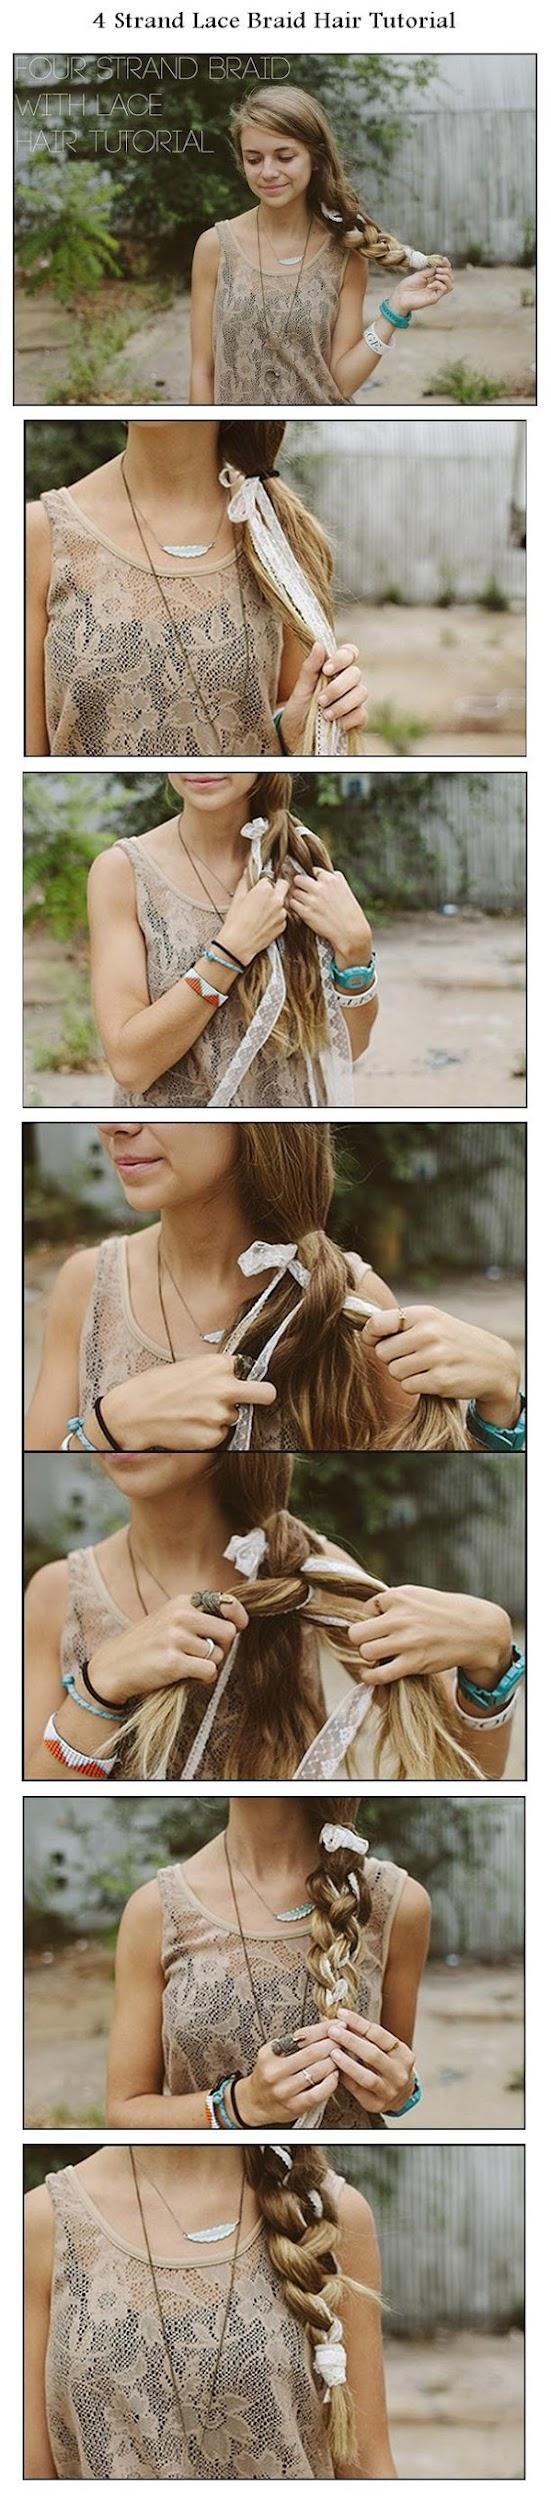 Strand Lace Braid Hair Tutorial | Beauty tutorials